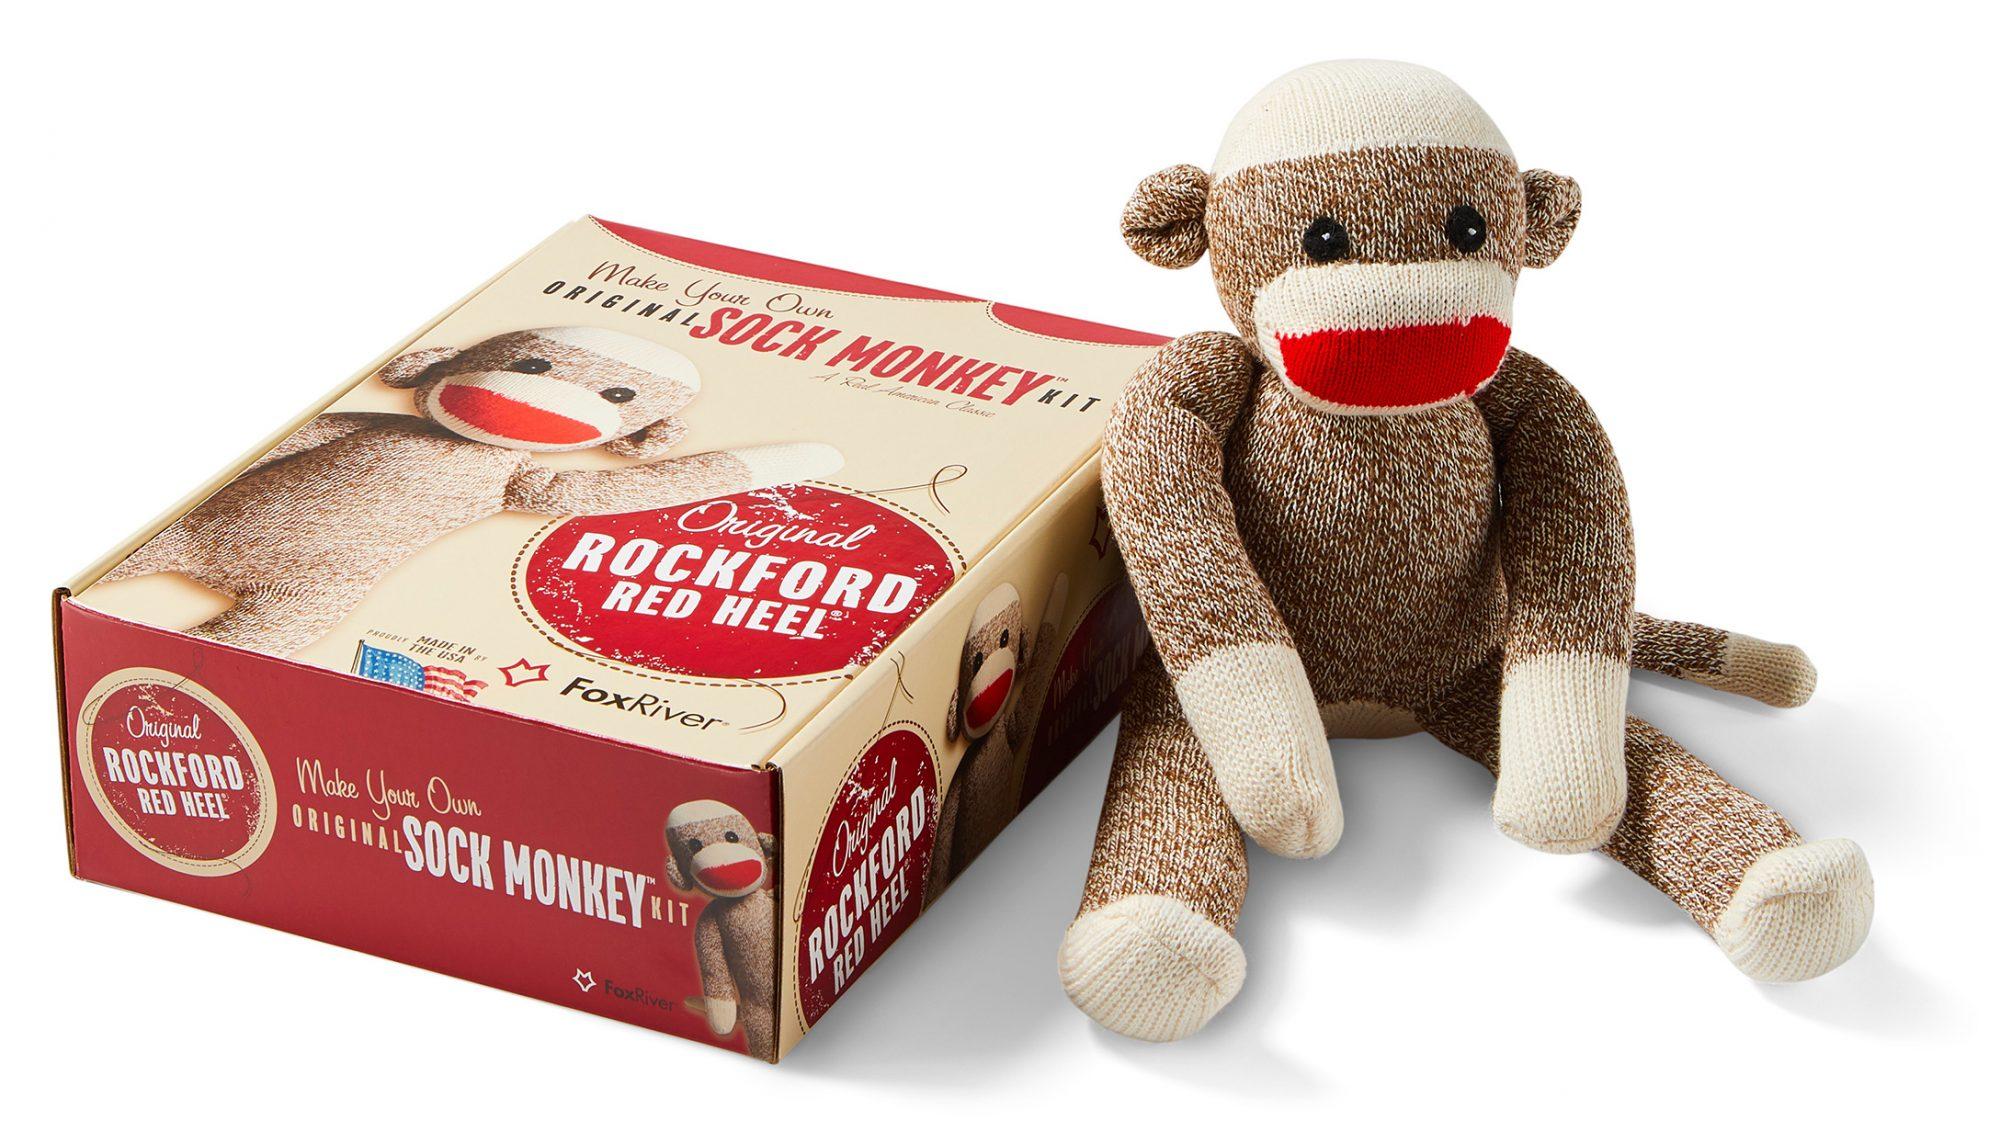 sock monkey kit original rockford red heel